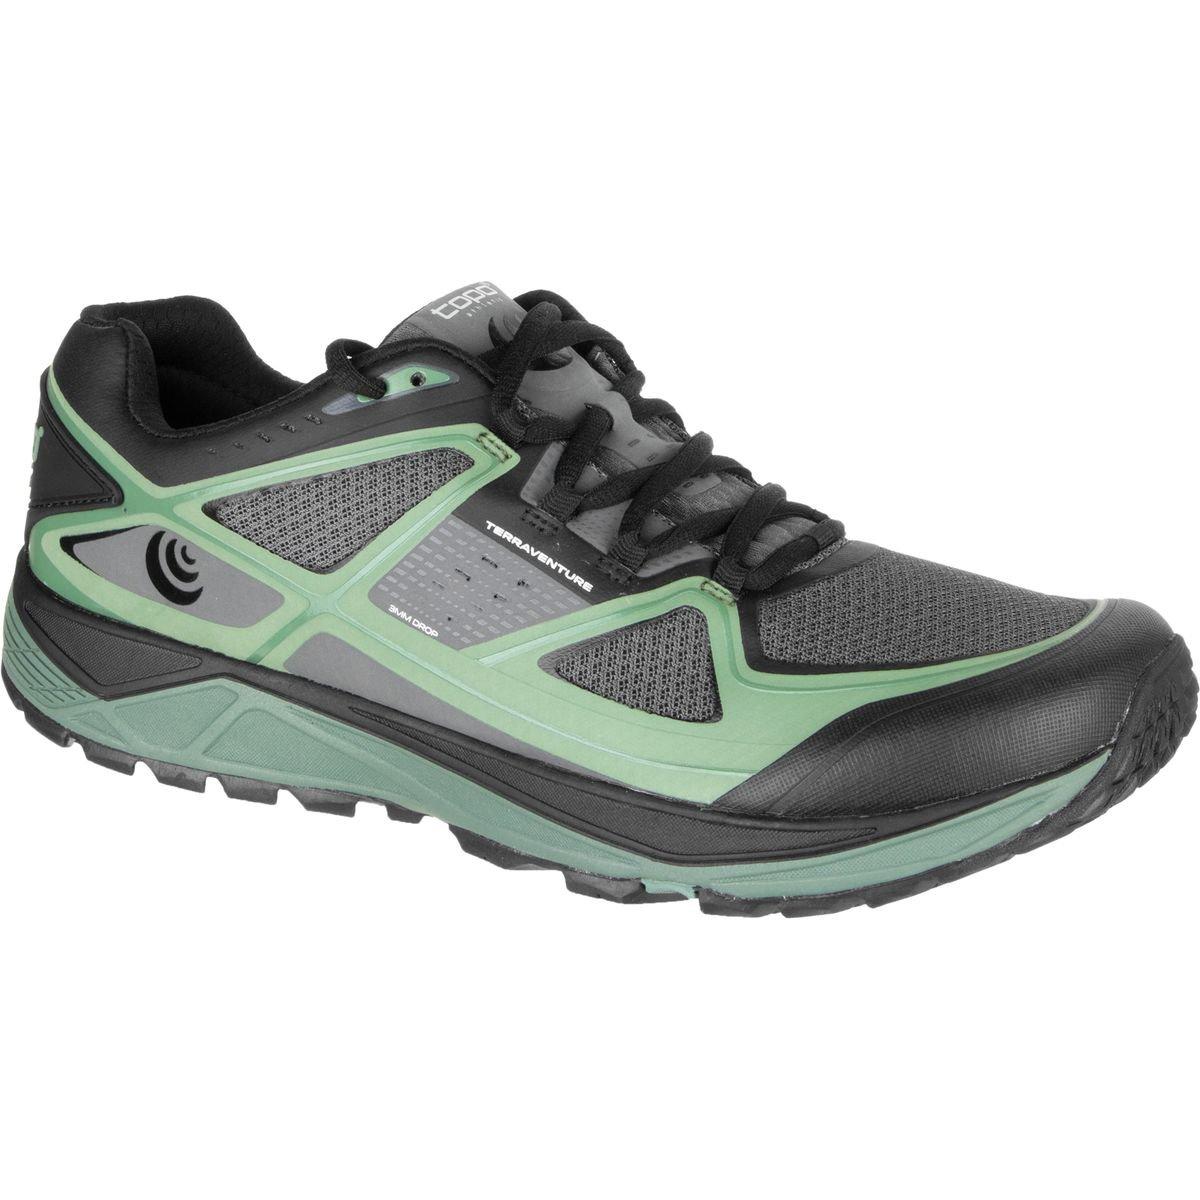 Topo Athletic terraventure – Zapatillas Hombre - 16M182-CHAGRN-115, Carbón/verde (Charcoal/green) 11.5 D(M) US|Carbón/verde (Charcoal/green)